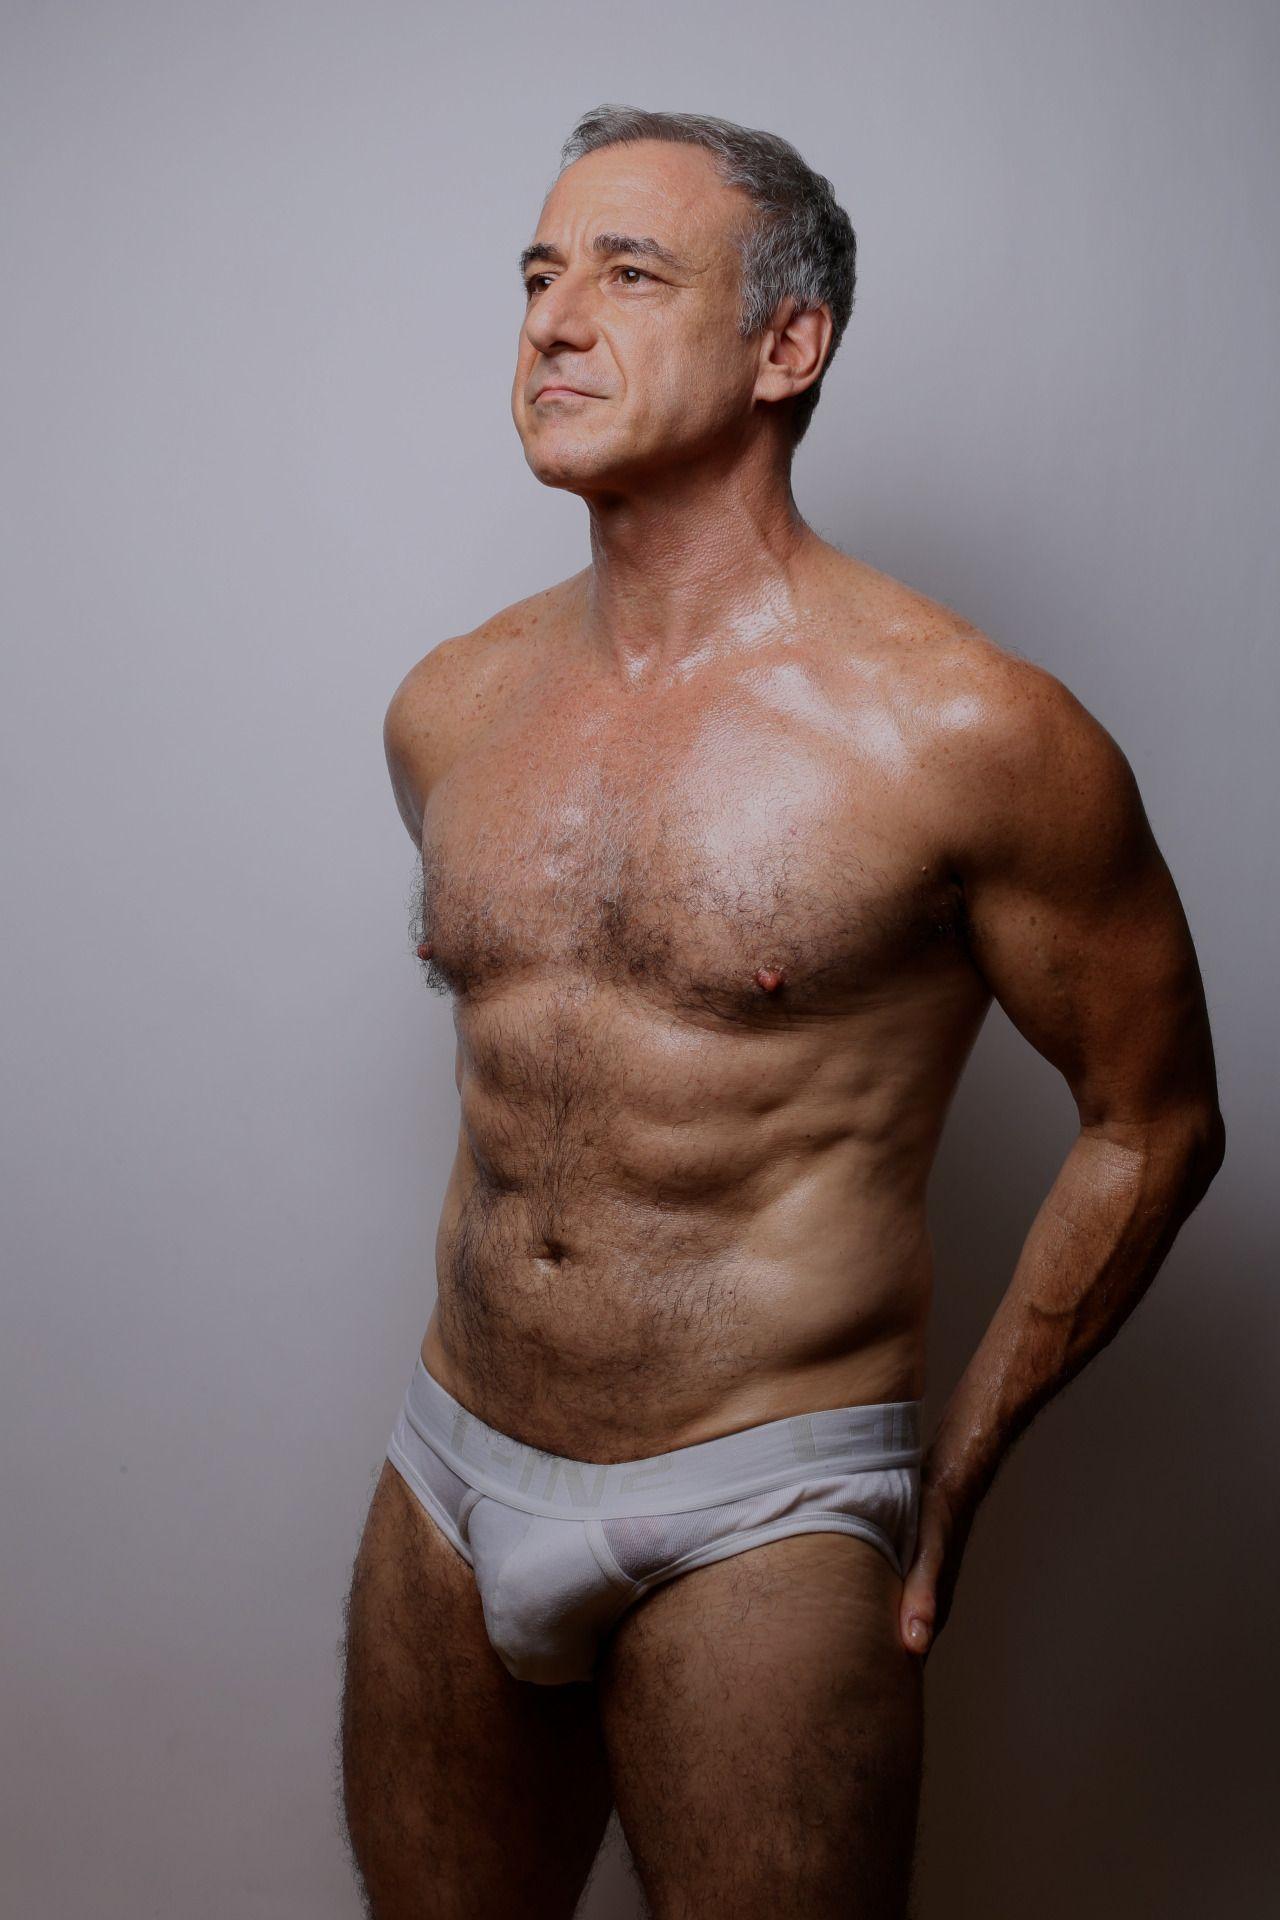 perfectdaddies | sexy mature men and women | pinterest | hot dads